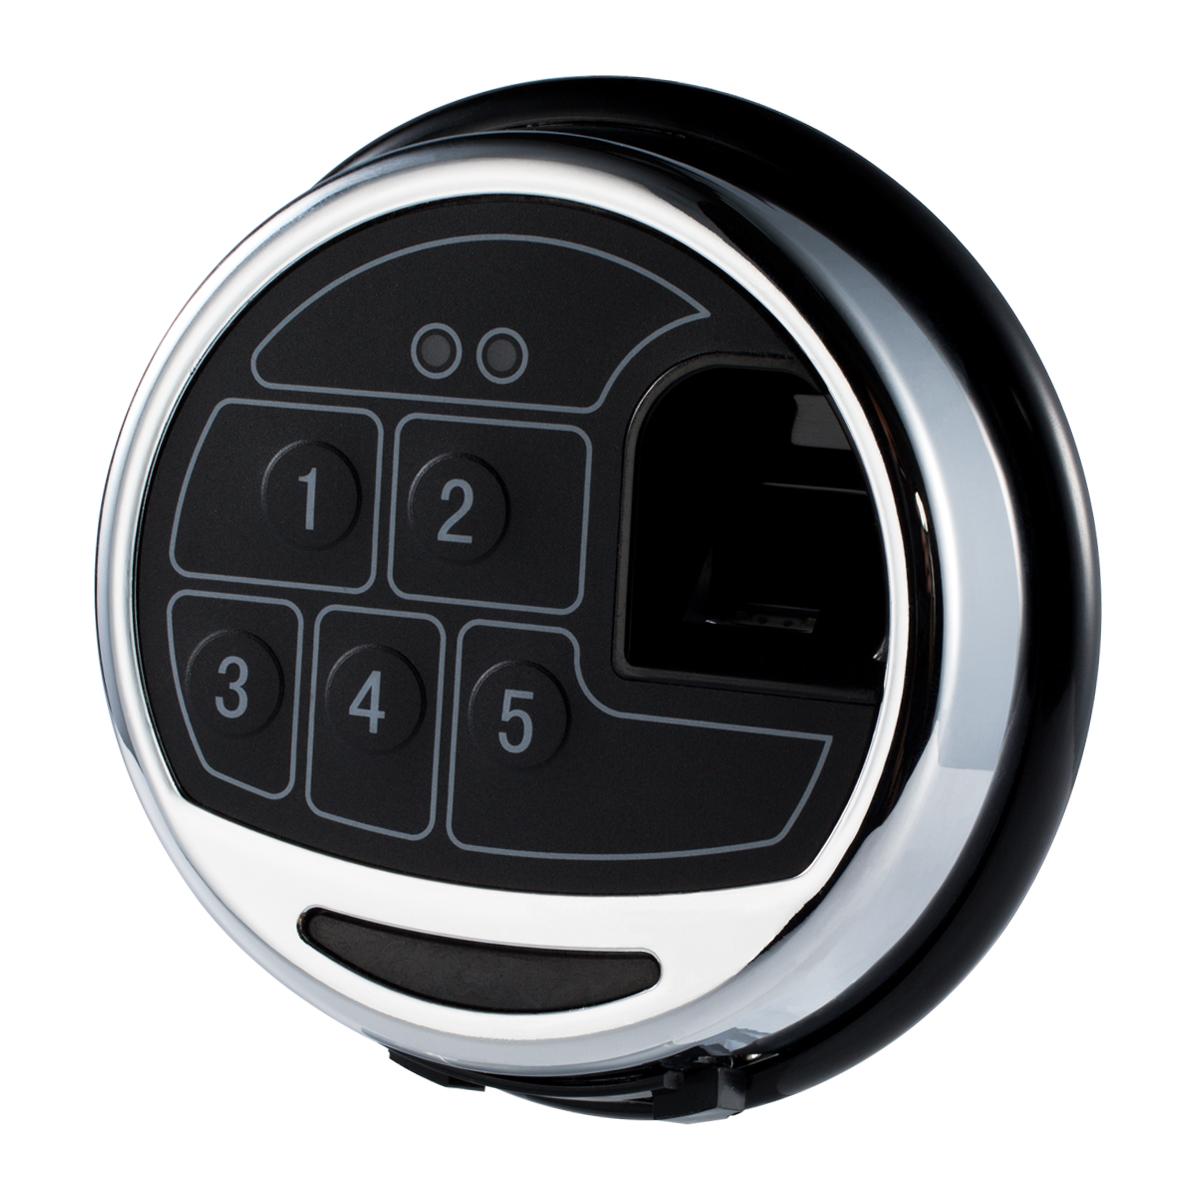 kcolefas electronic safe lock entry 30271 with fingerprint input